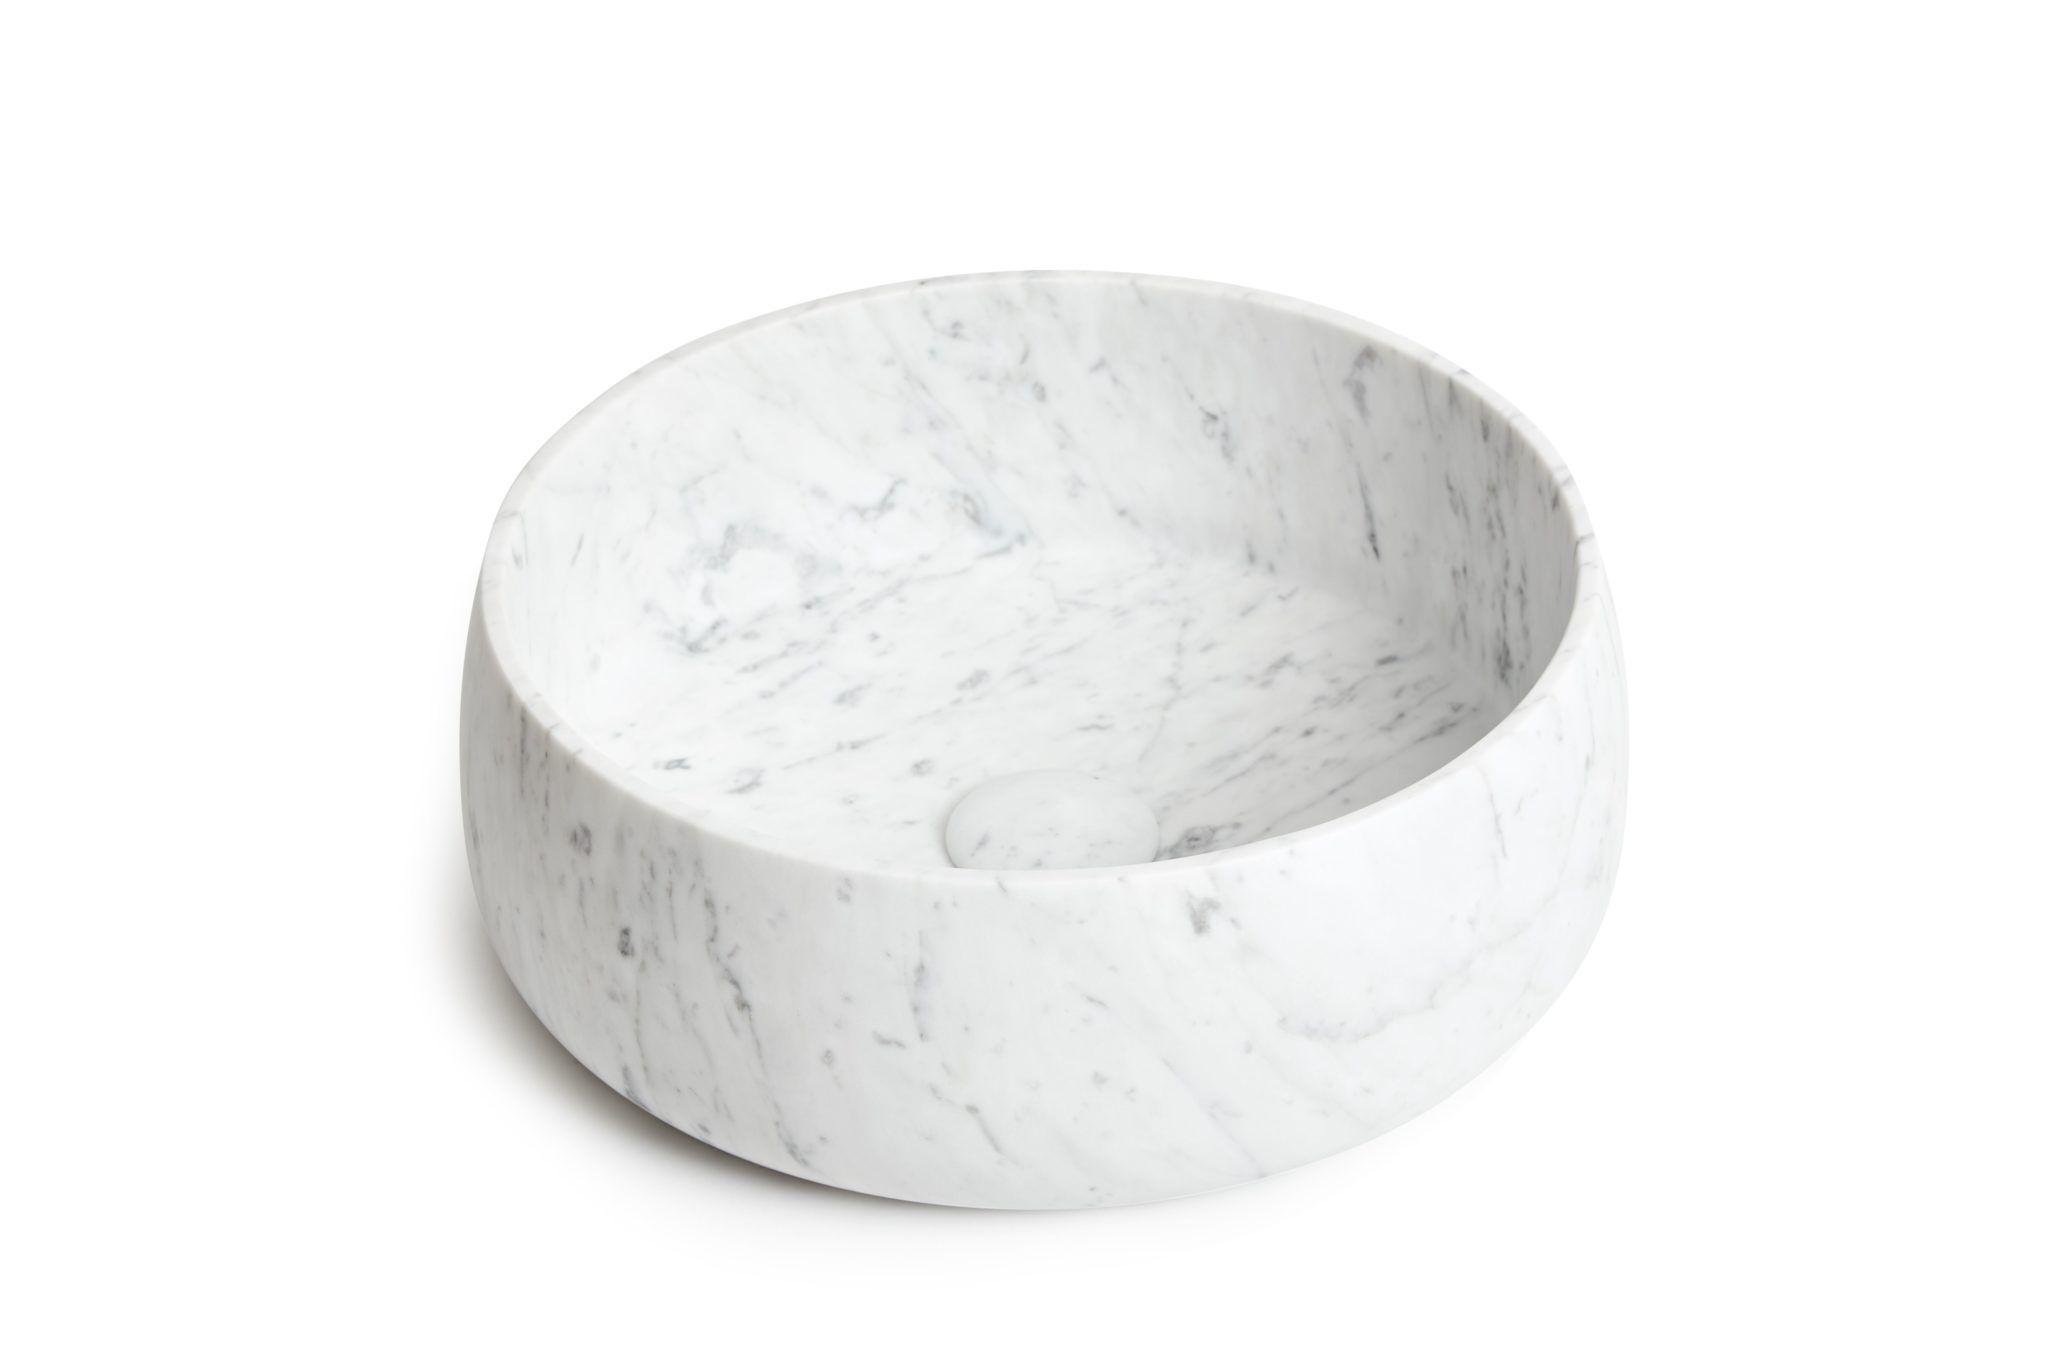 carrara-stone-round-basin-swatch